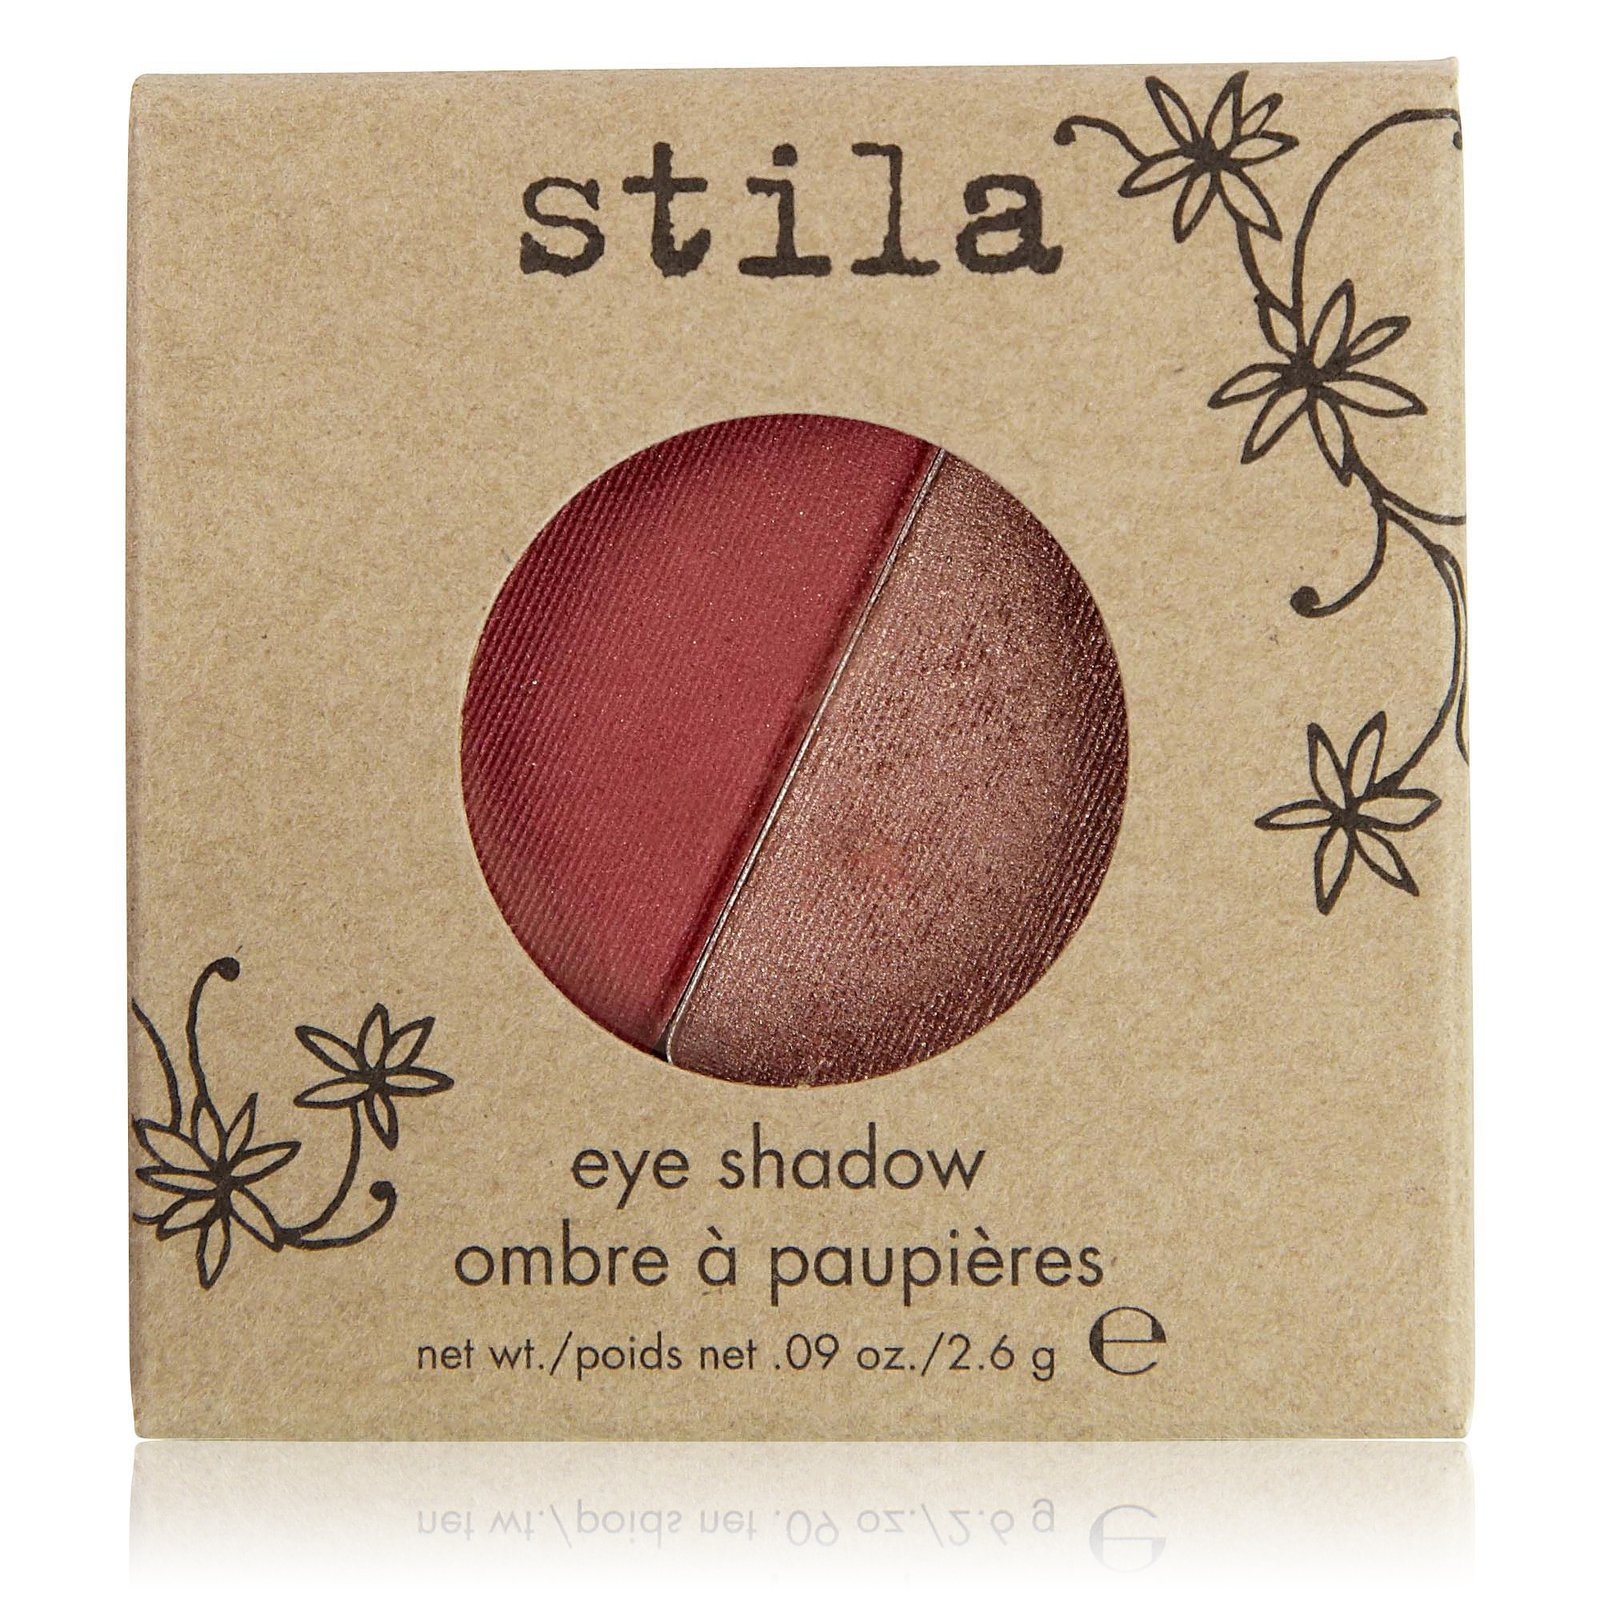 Stila Cosmetics Eye Shadow Duo - Terracota